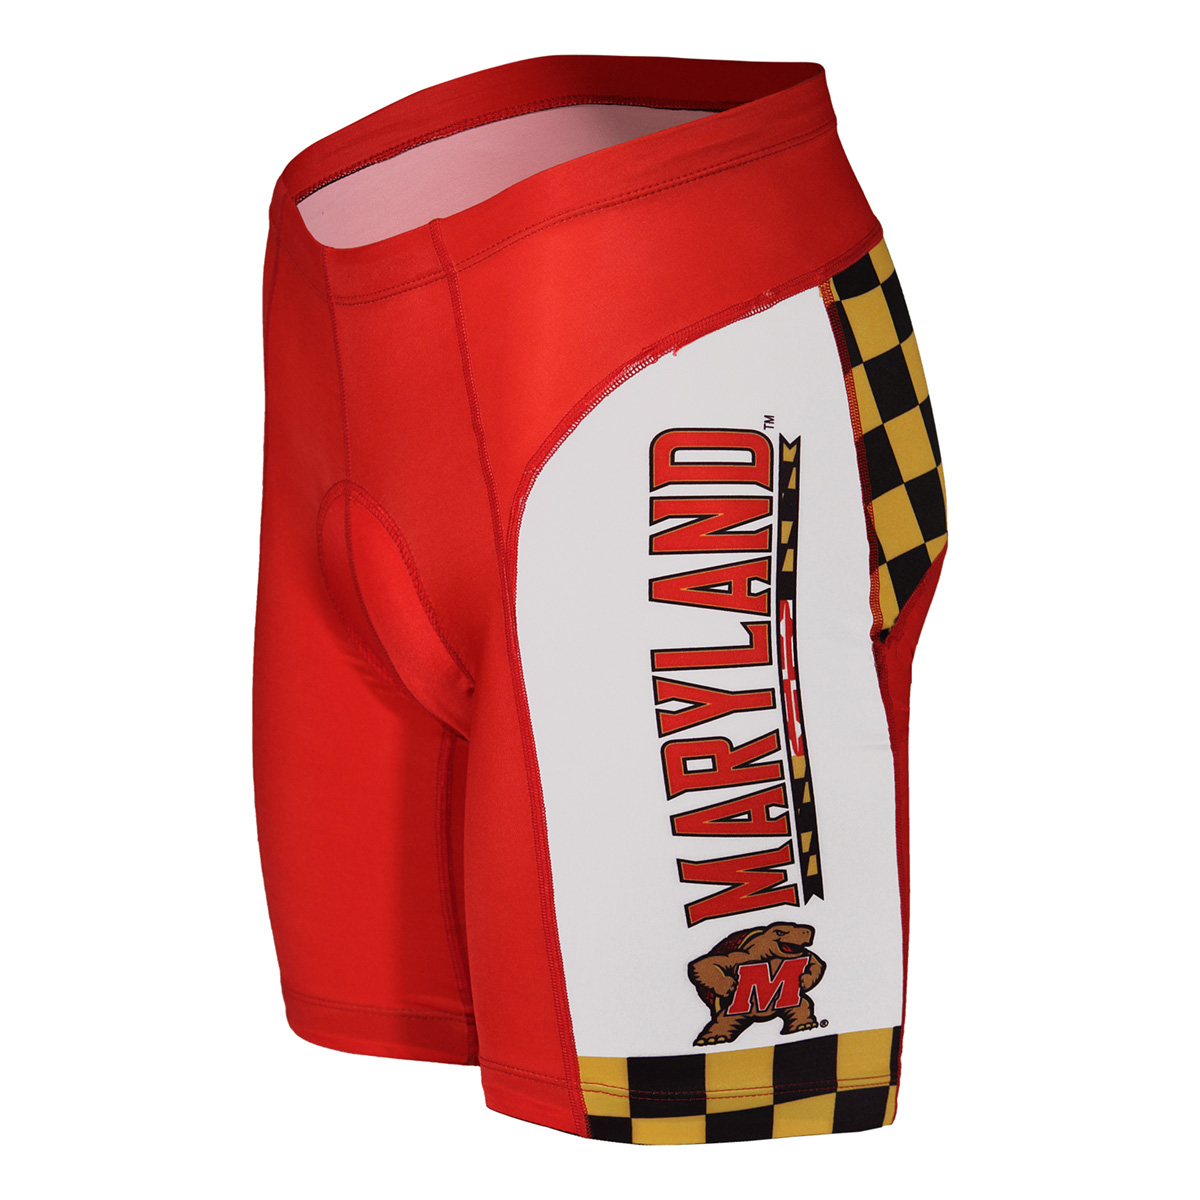 Adrenaline Promotions University of Maryland Terrapins Cycling Shorts (University of Maryland Terrapins - S)